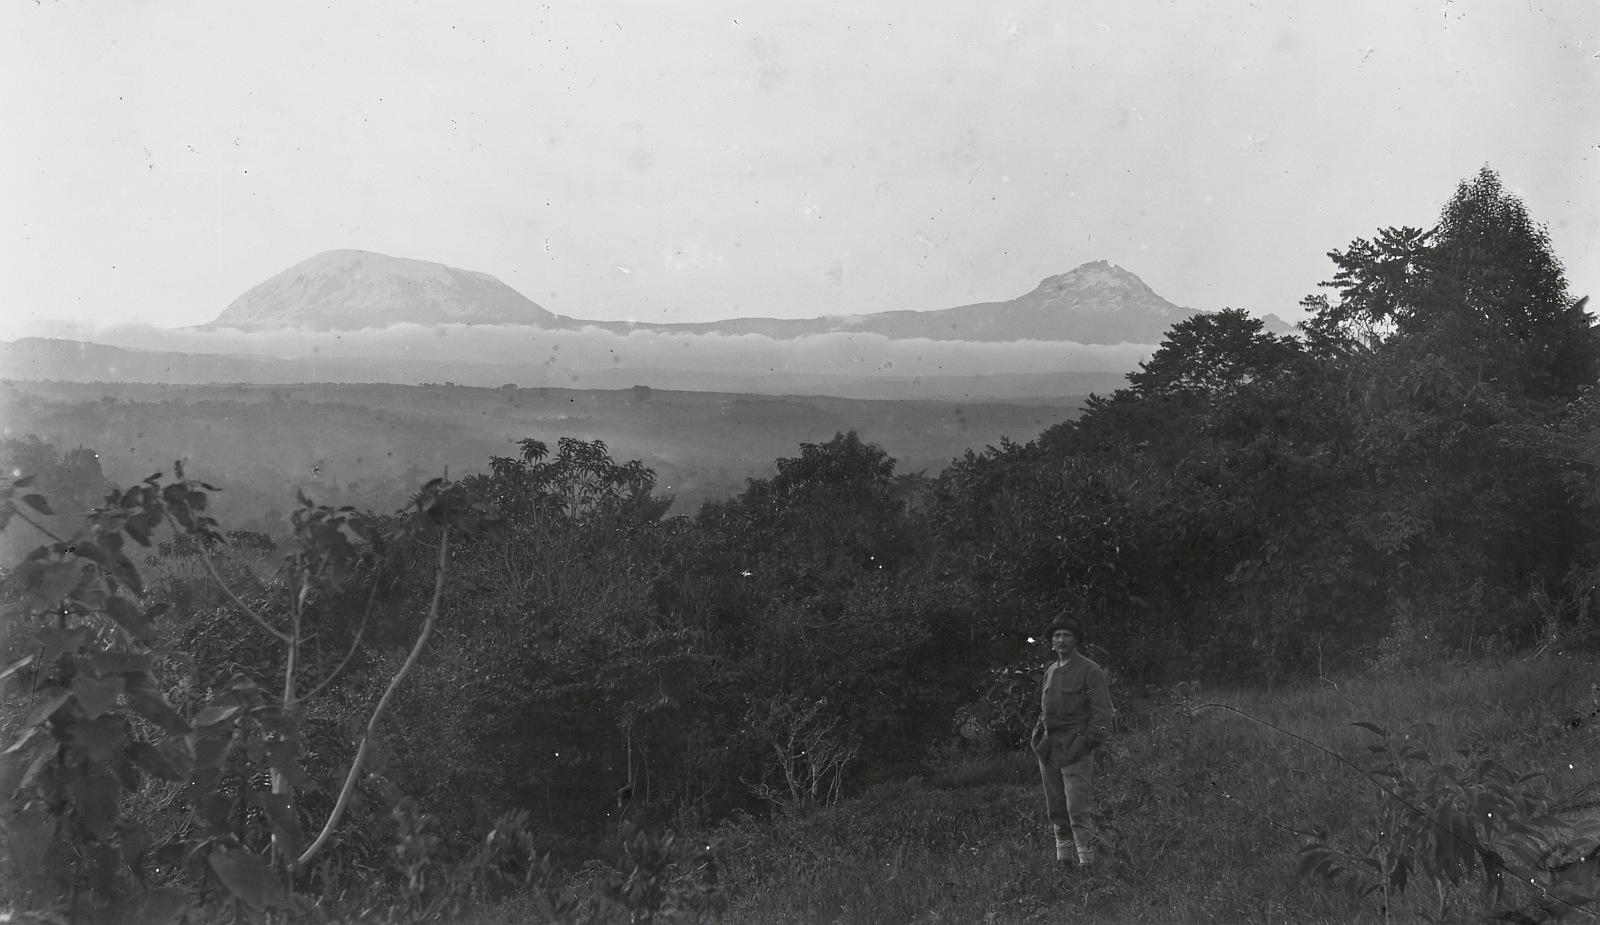 383. Вид на горный тропический лес с холма в Моши (около 1000 м) с юга. На переднем плане Ганс Мейер